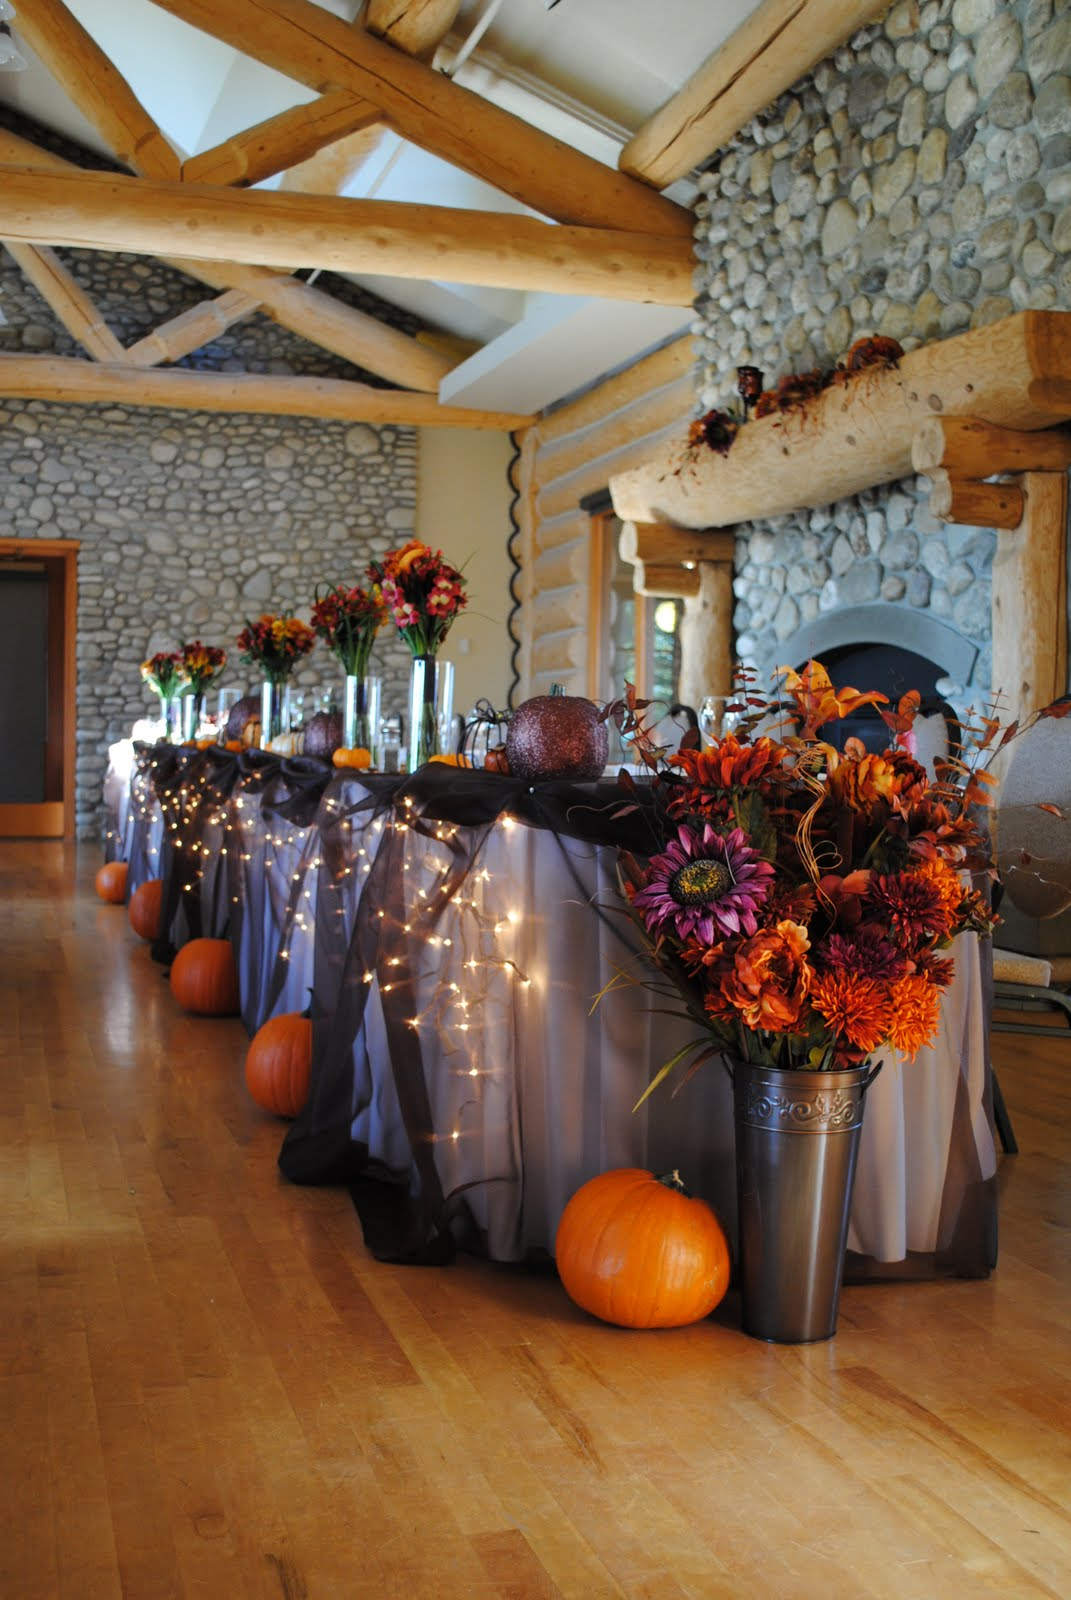 Wishahmon Blog: Pumpkin Themed Wedding!